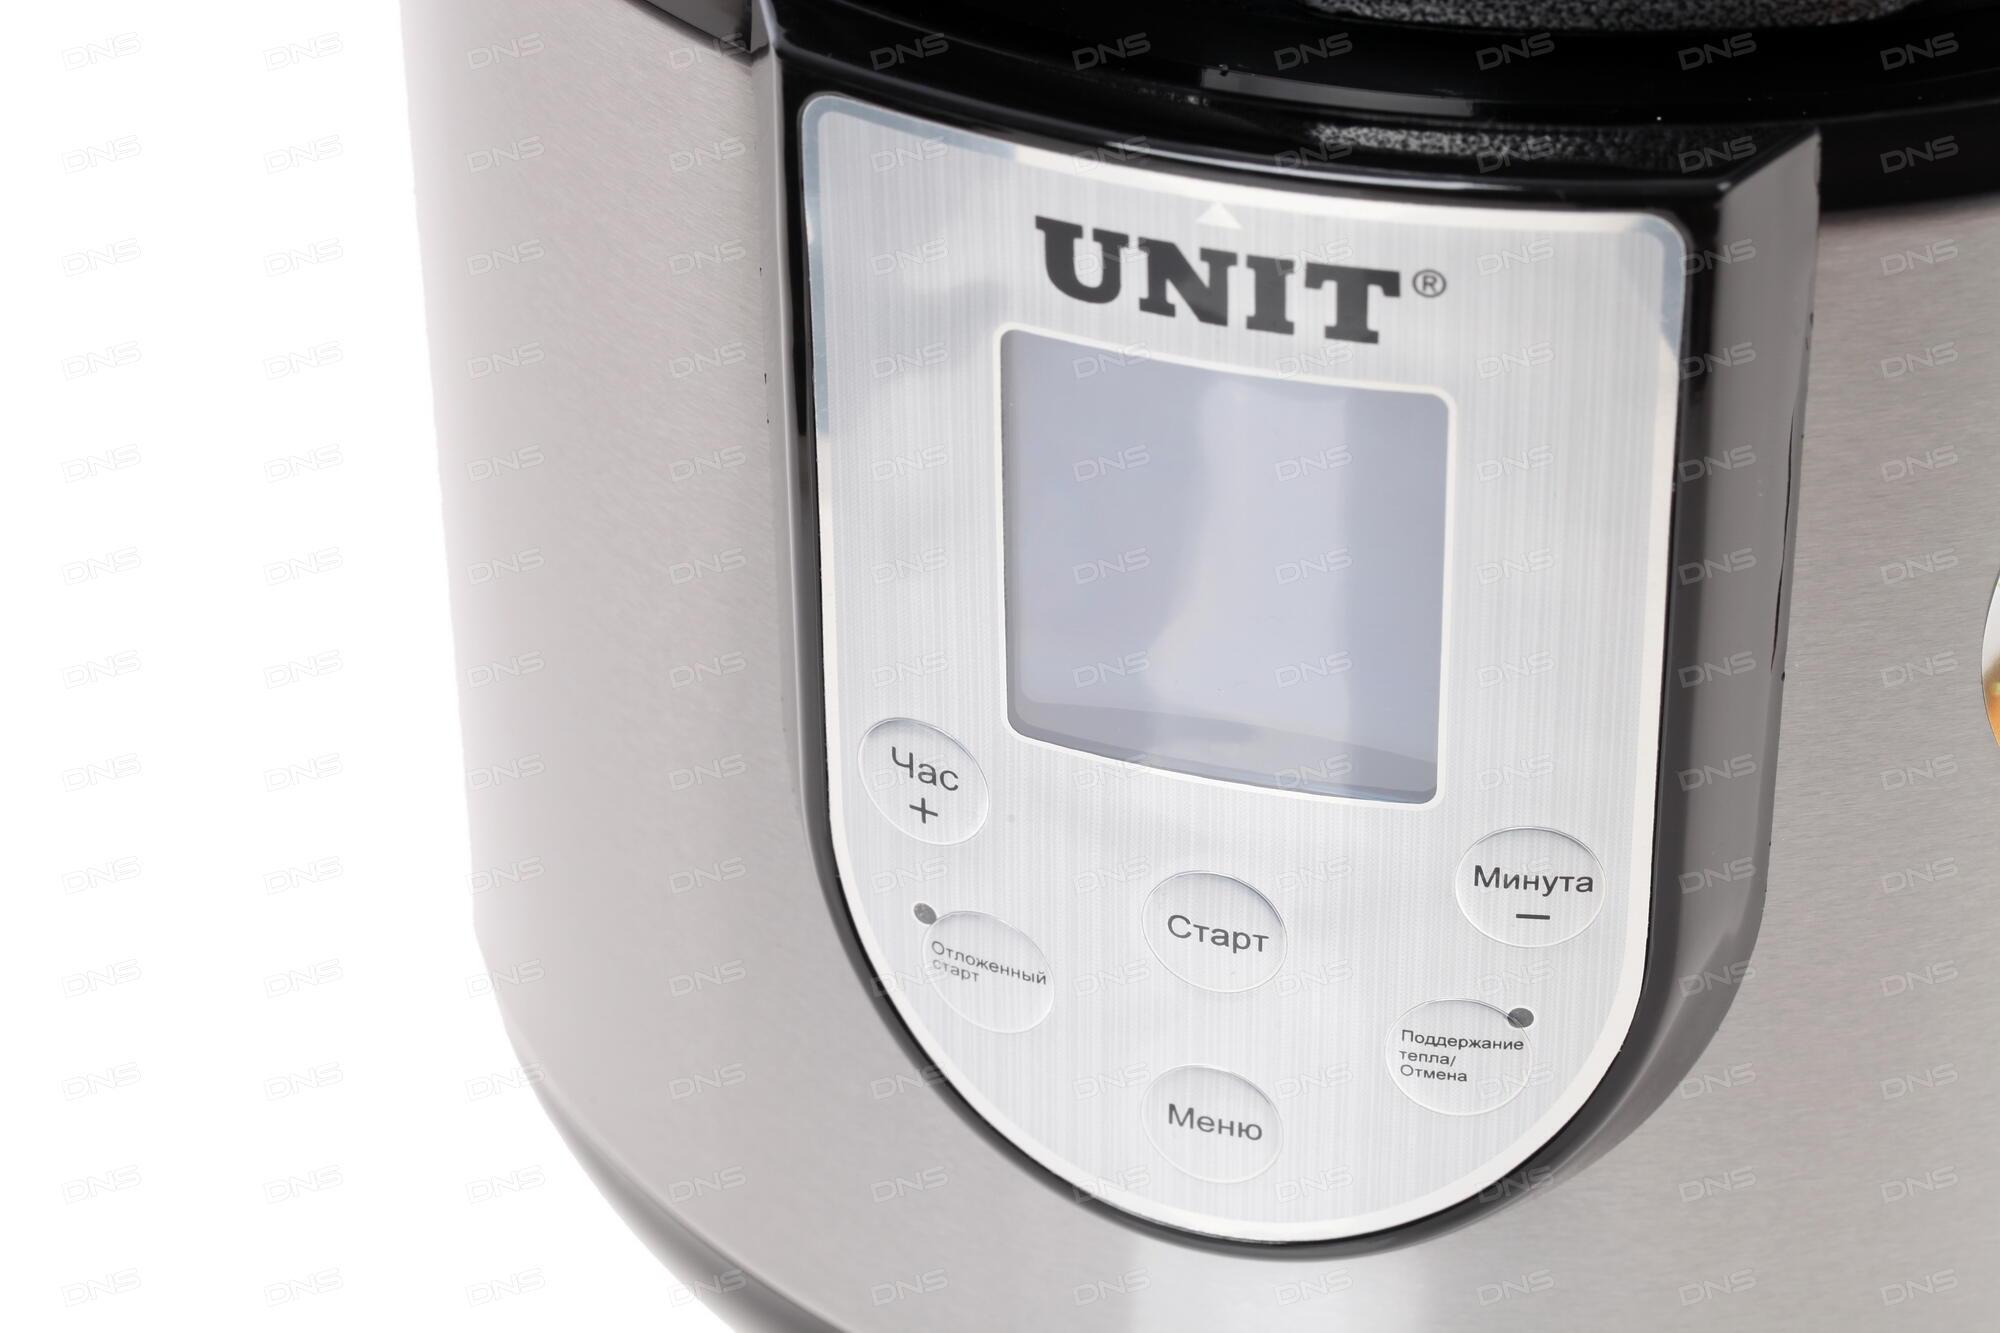 рецепты для мультиварка unit usp 1210s